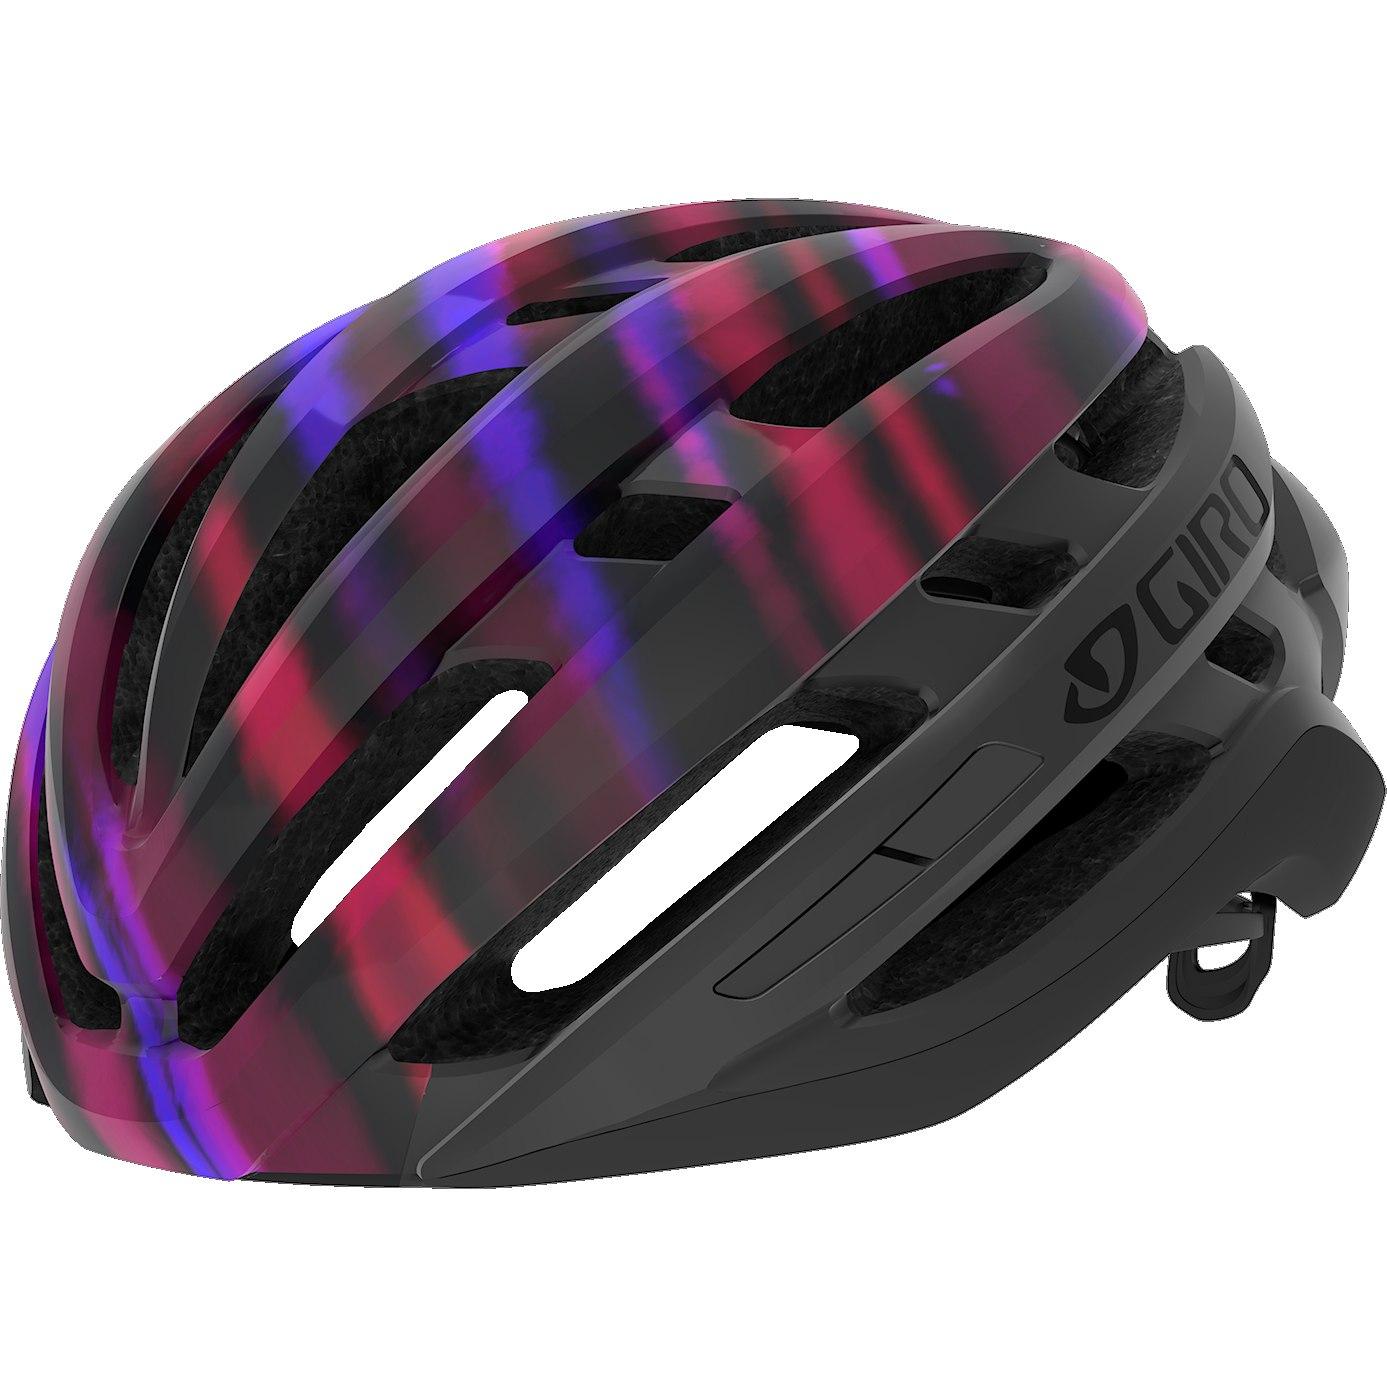 Čelada giro agilis w matt black electric purple